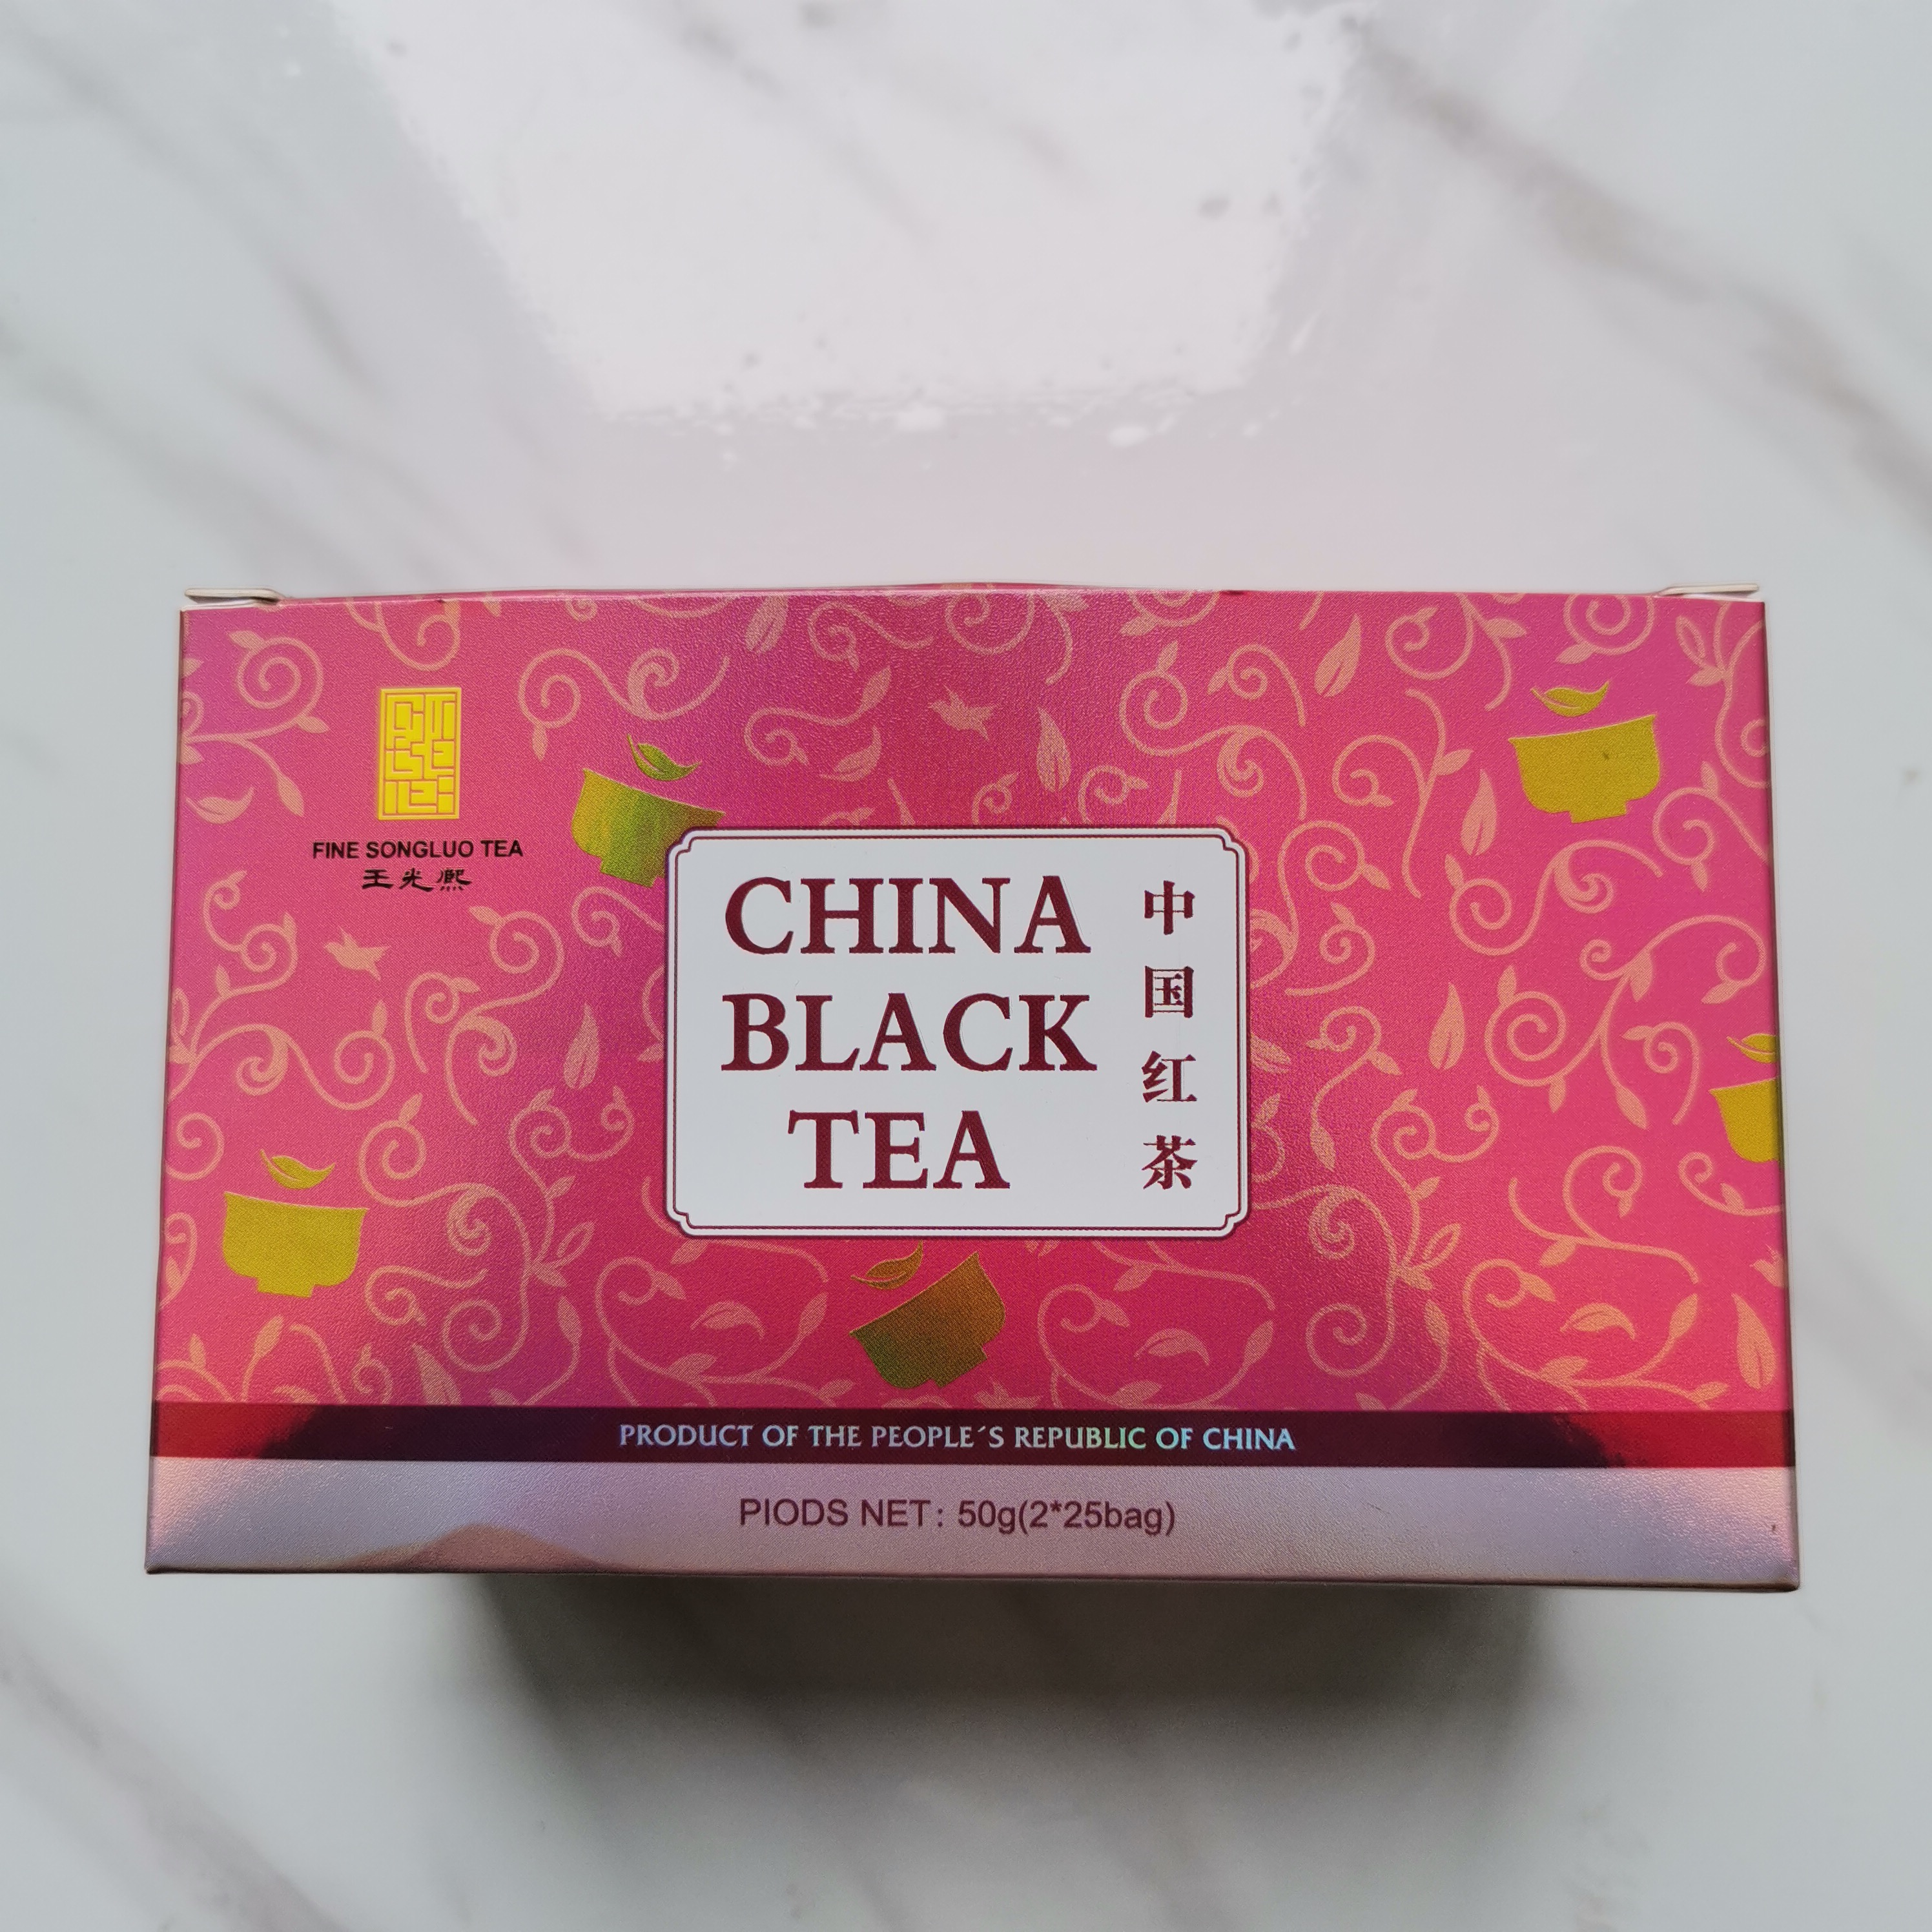 Chinese bagged Keemun black tea natural tea leaves organic packed by ecofriendly tea bags wholesale - 4uTea | 4uTea.com